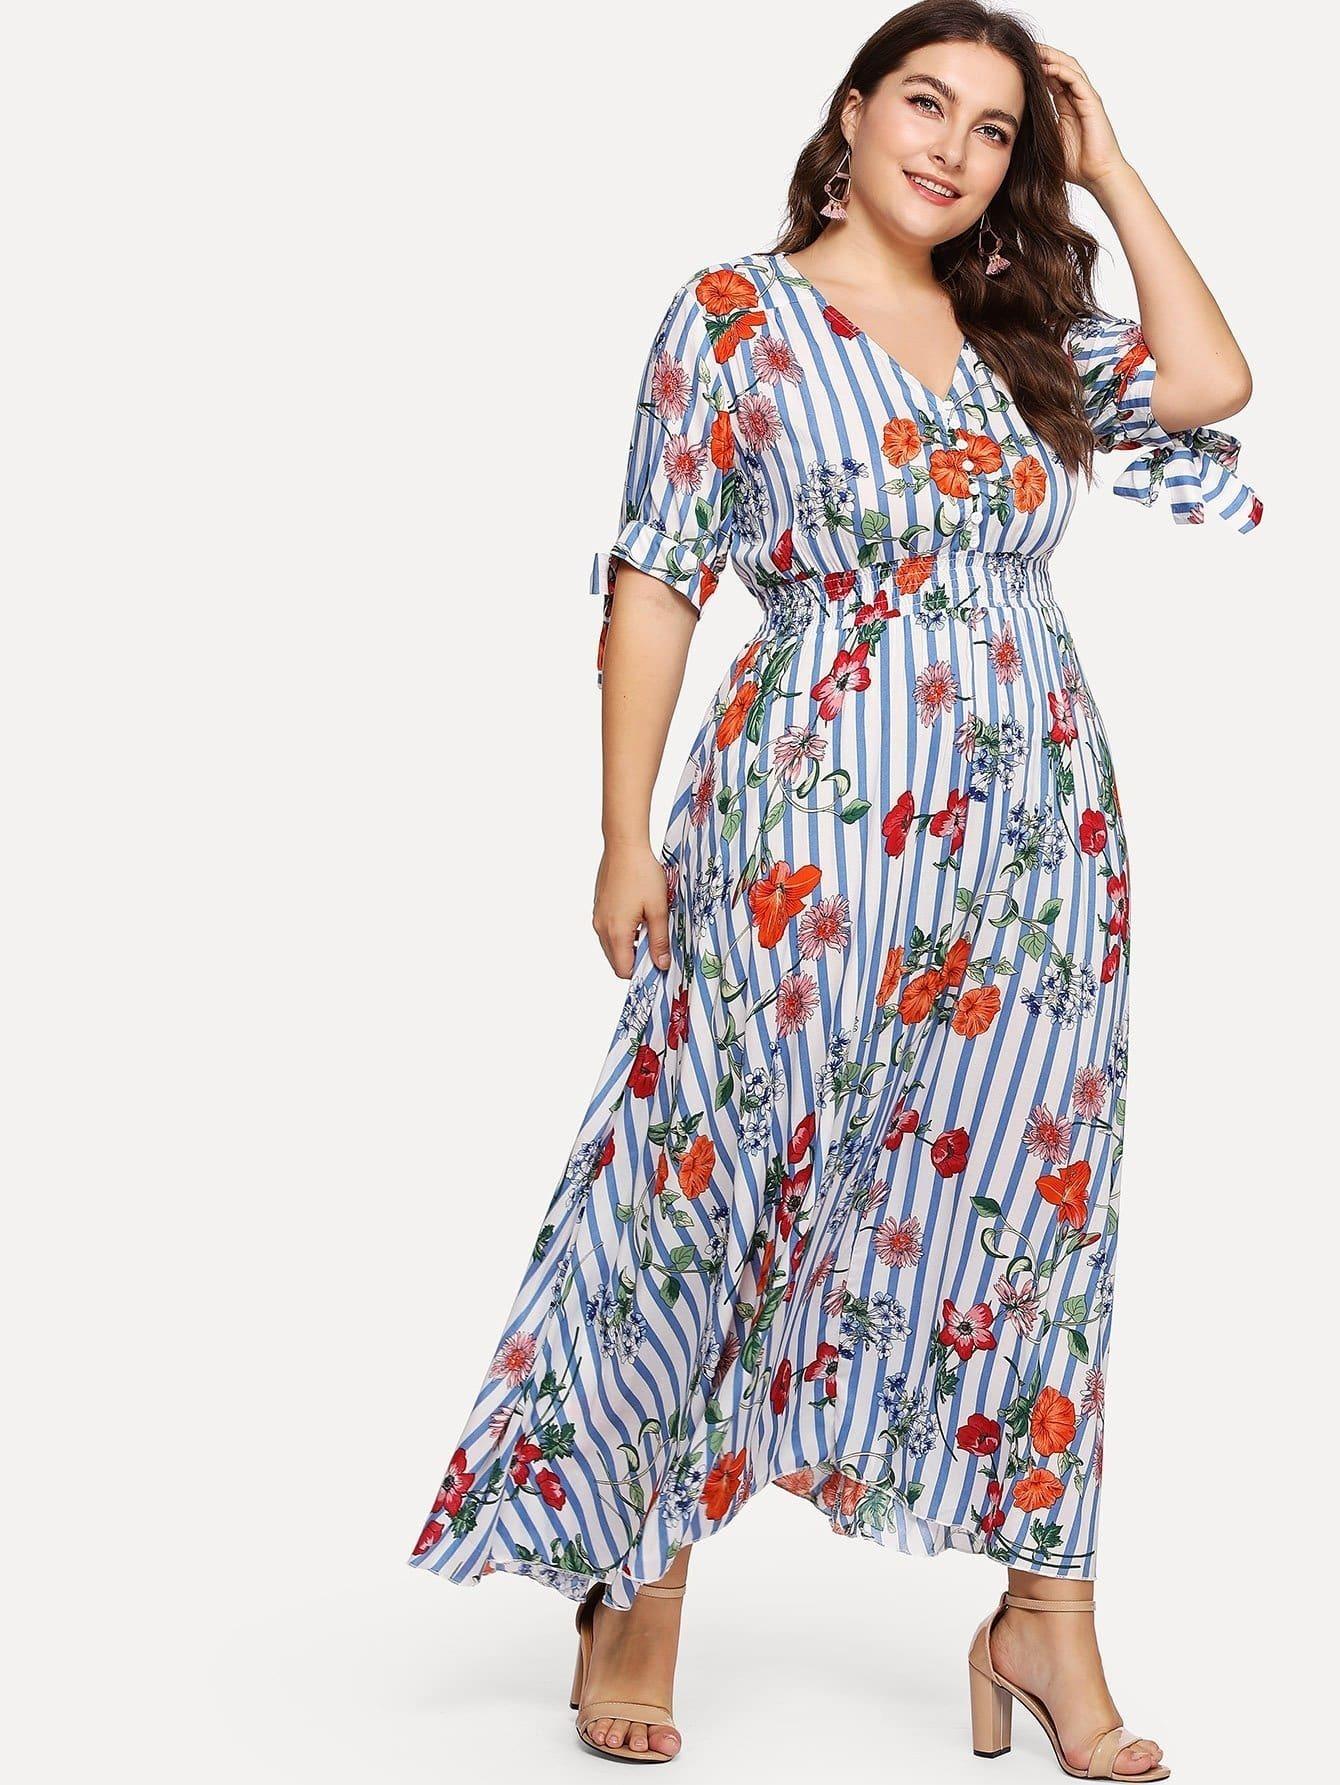 Button Front Shirred Waist Floral & Stripe Dress shirred waist zip back fit